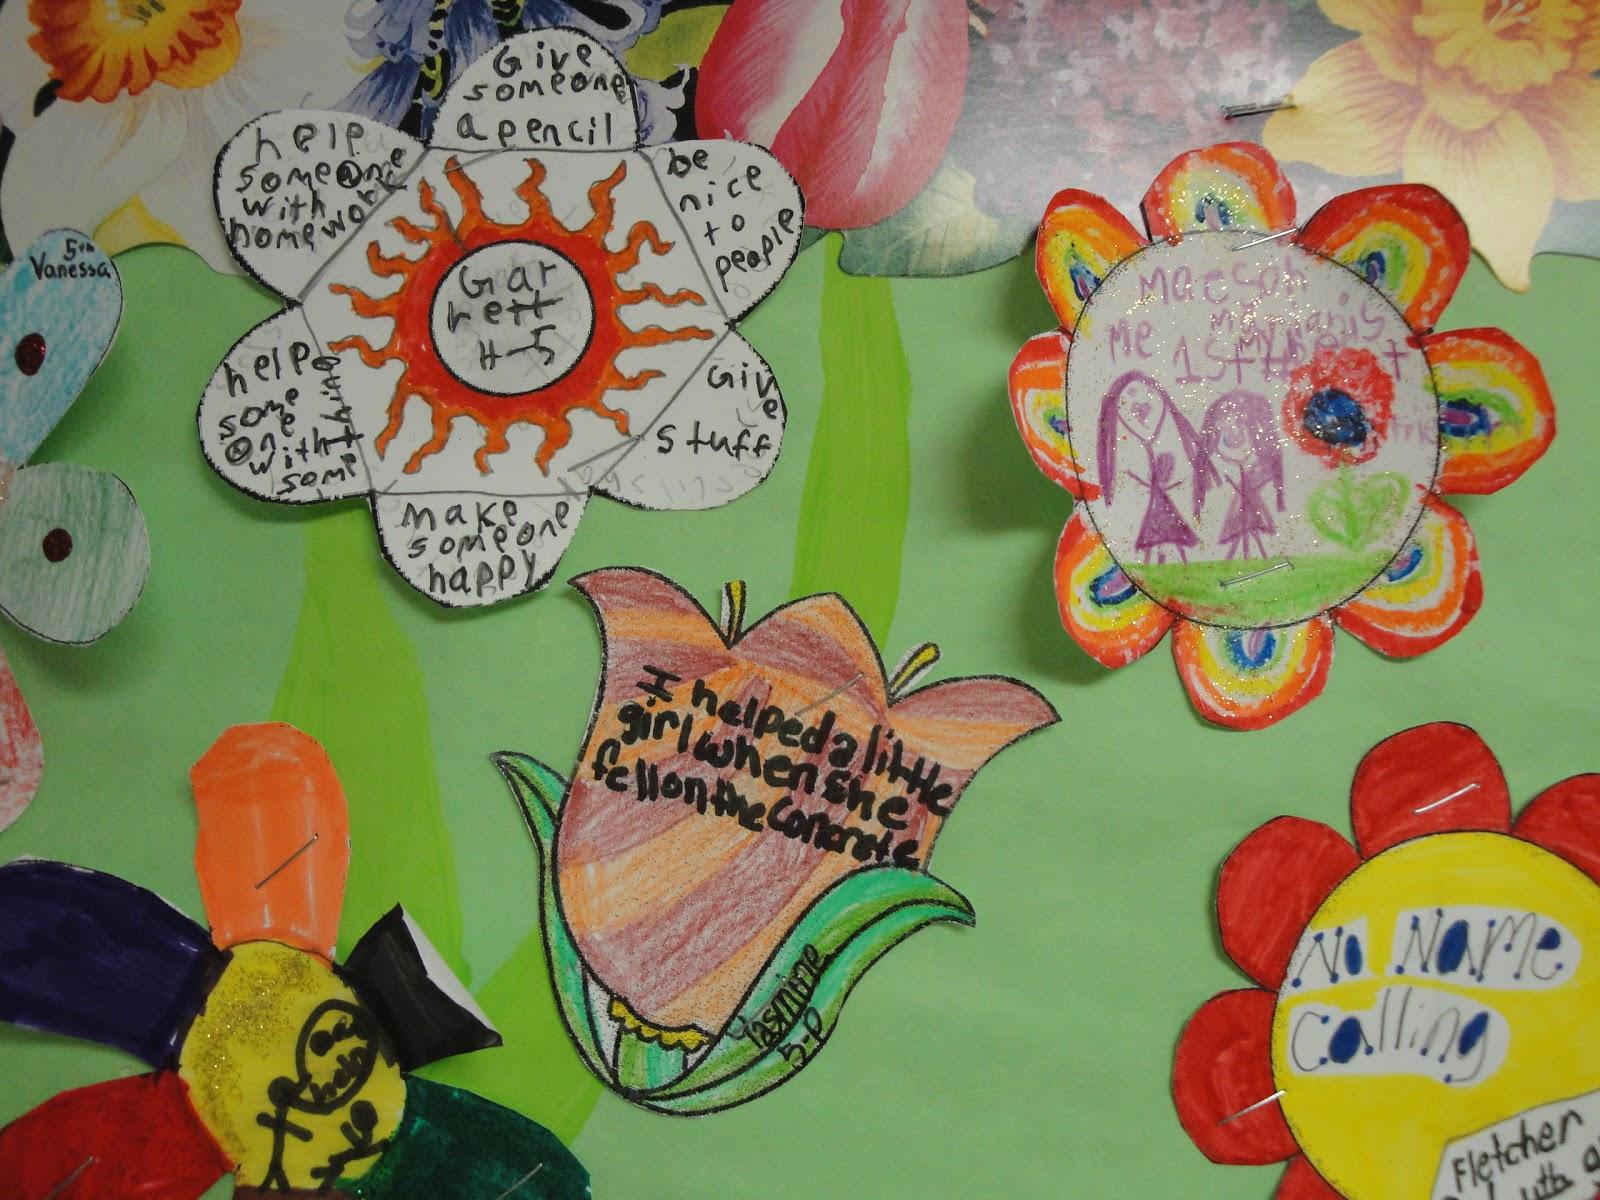 Garden Bulletin Board Ideas School counselor blog school counselor spotlight kindness garden workwithnaturefo